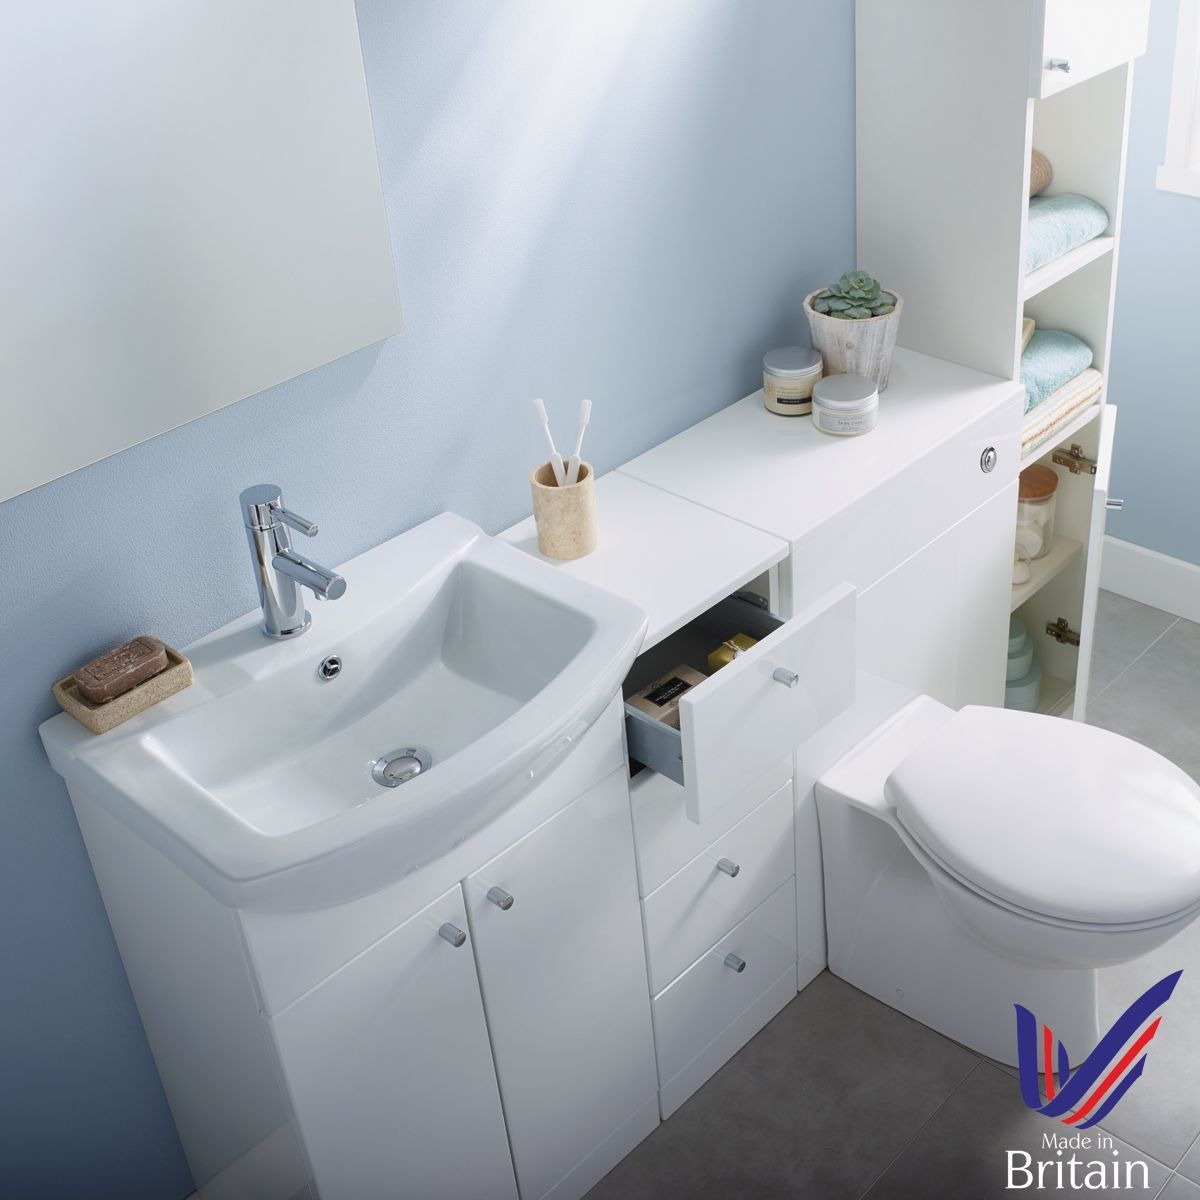 Ikoma White Gloss Vanity Unit with Basin 550mm Overhead